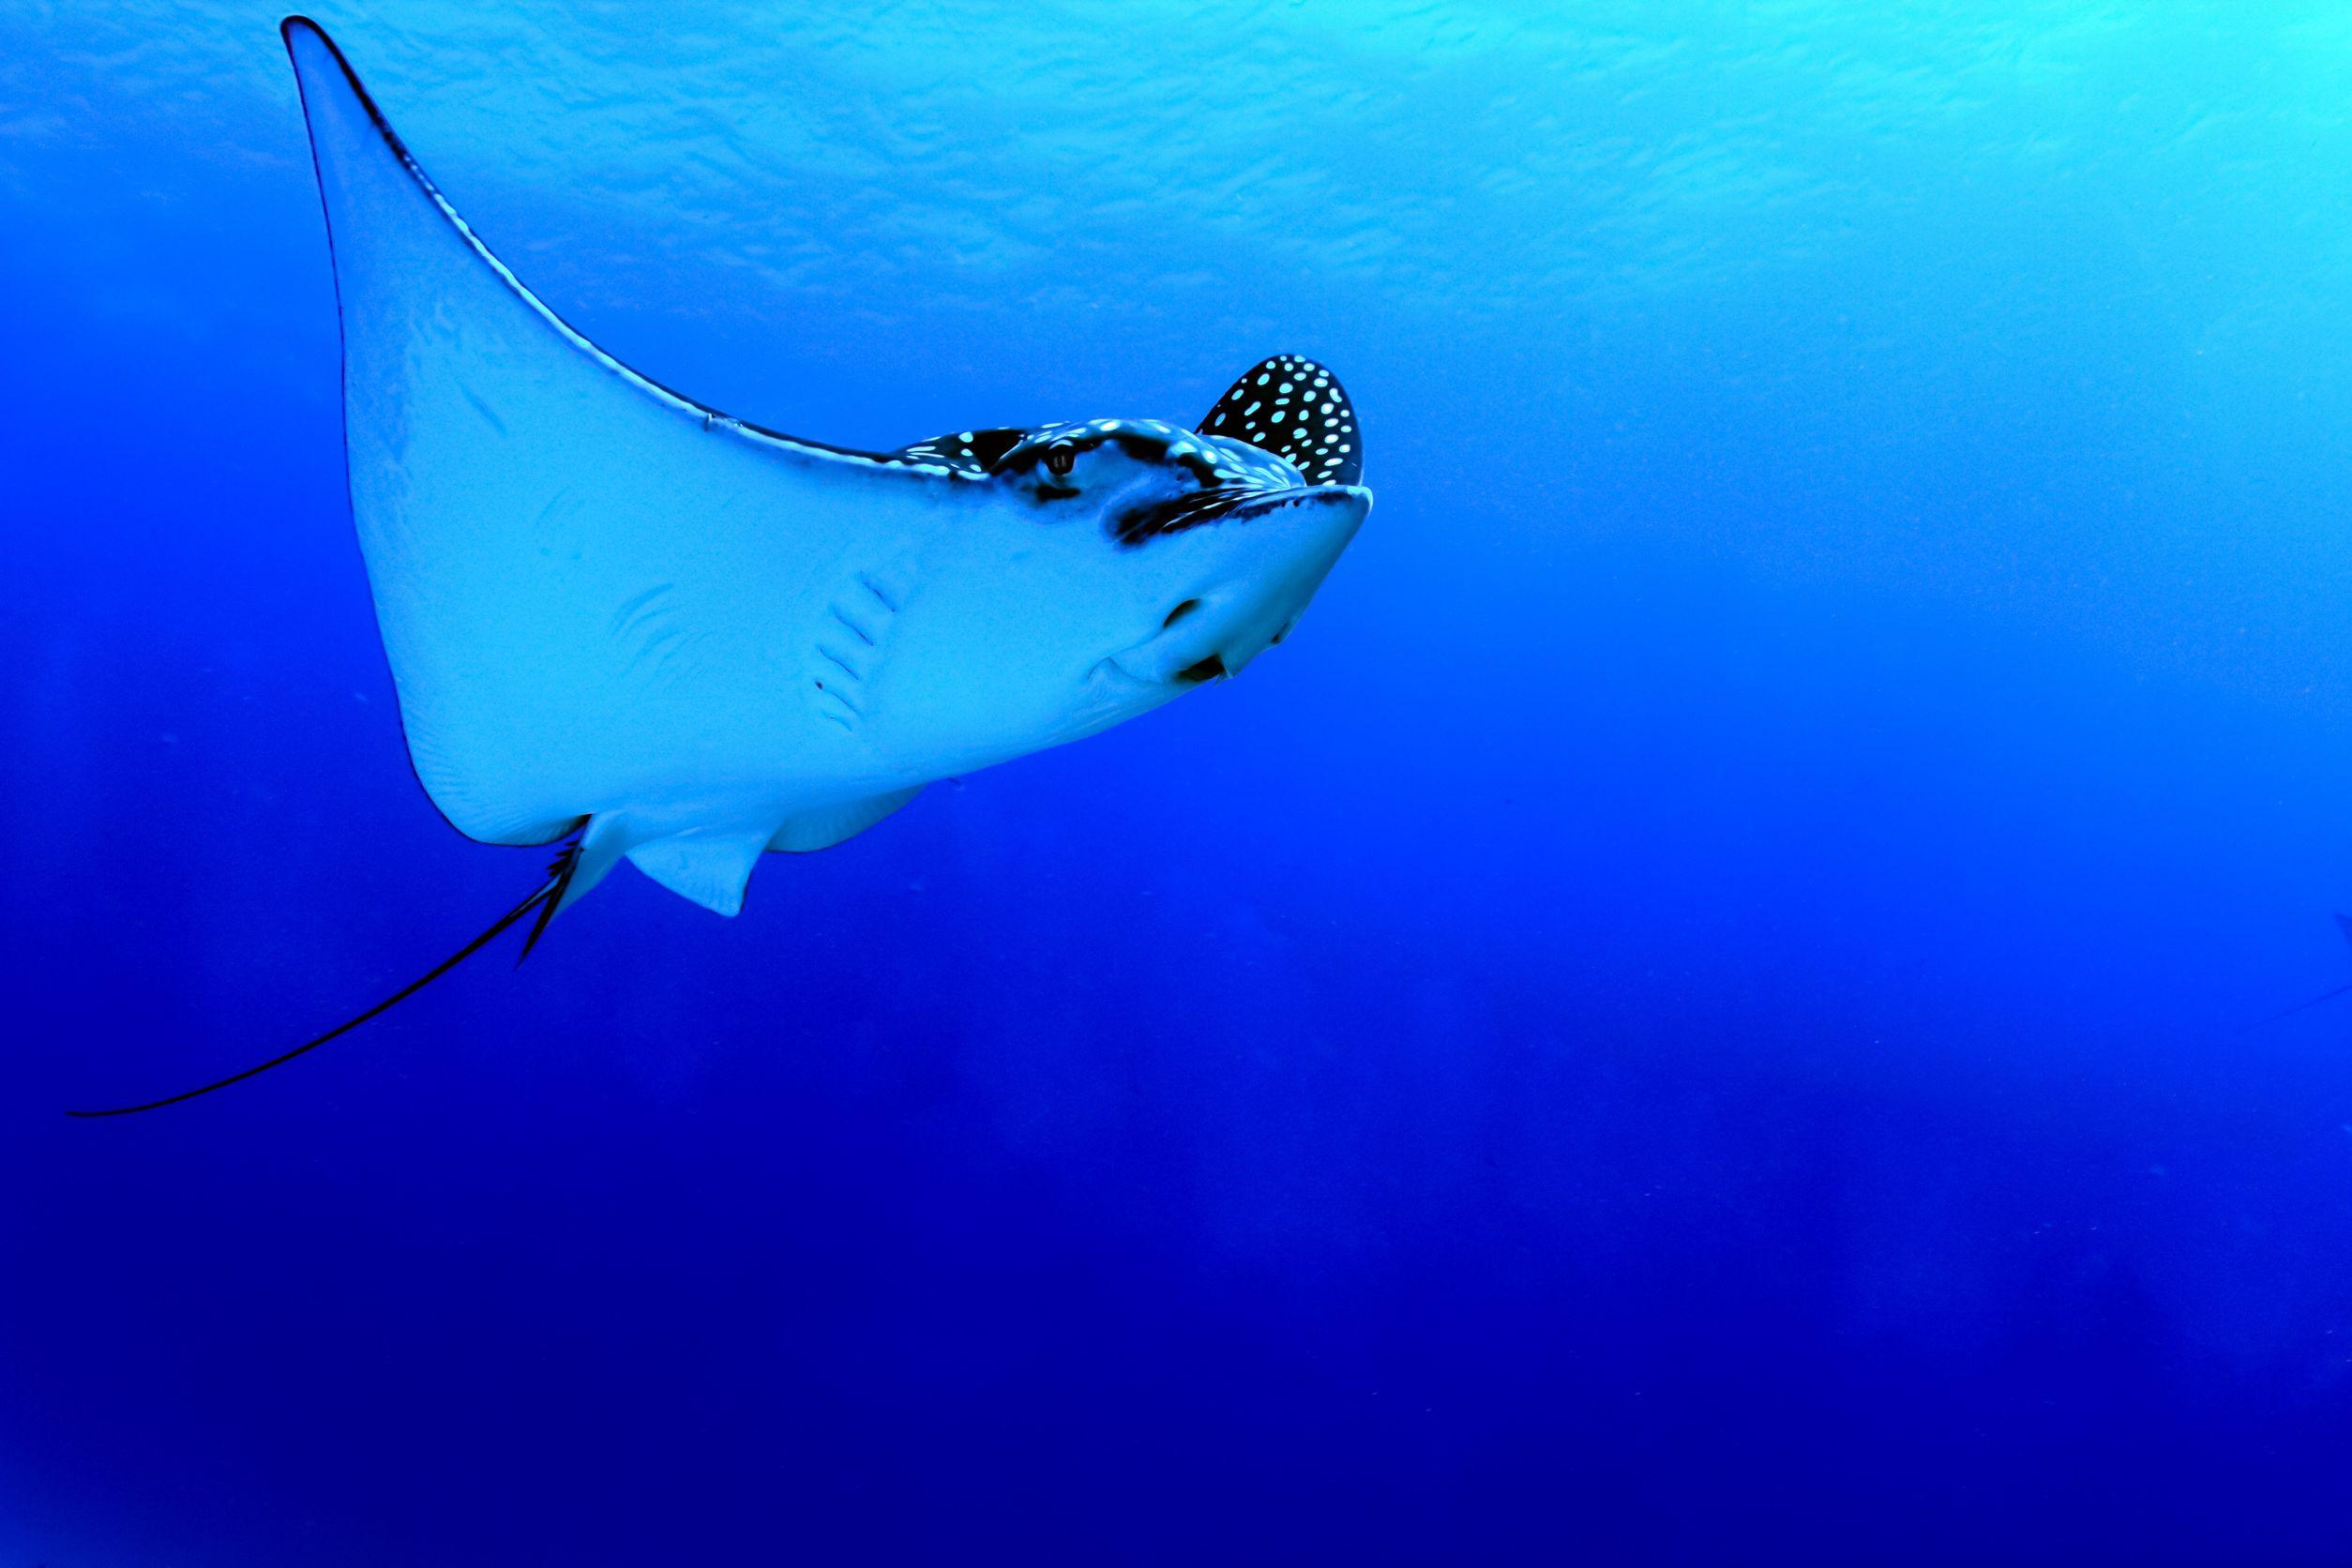 caribbean sting ray 123rf